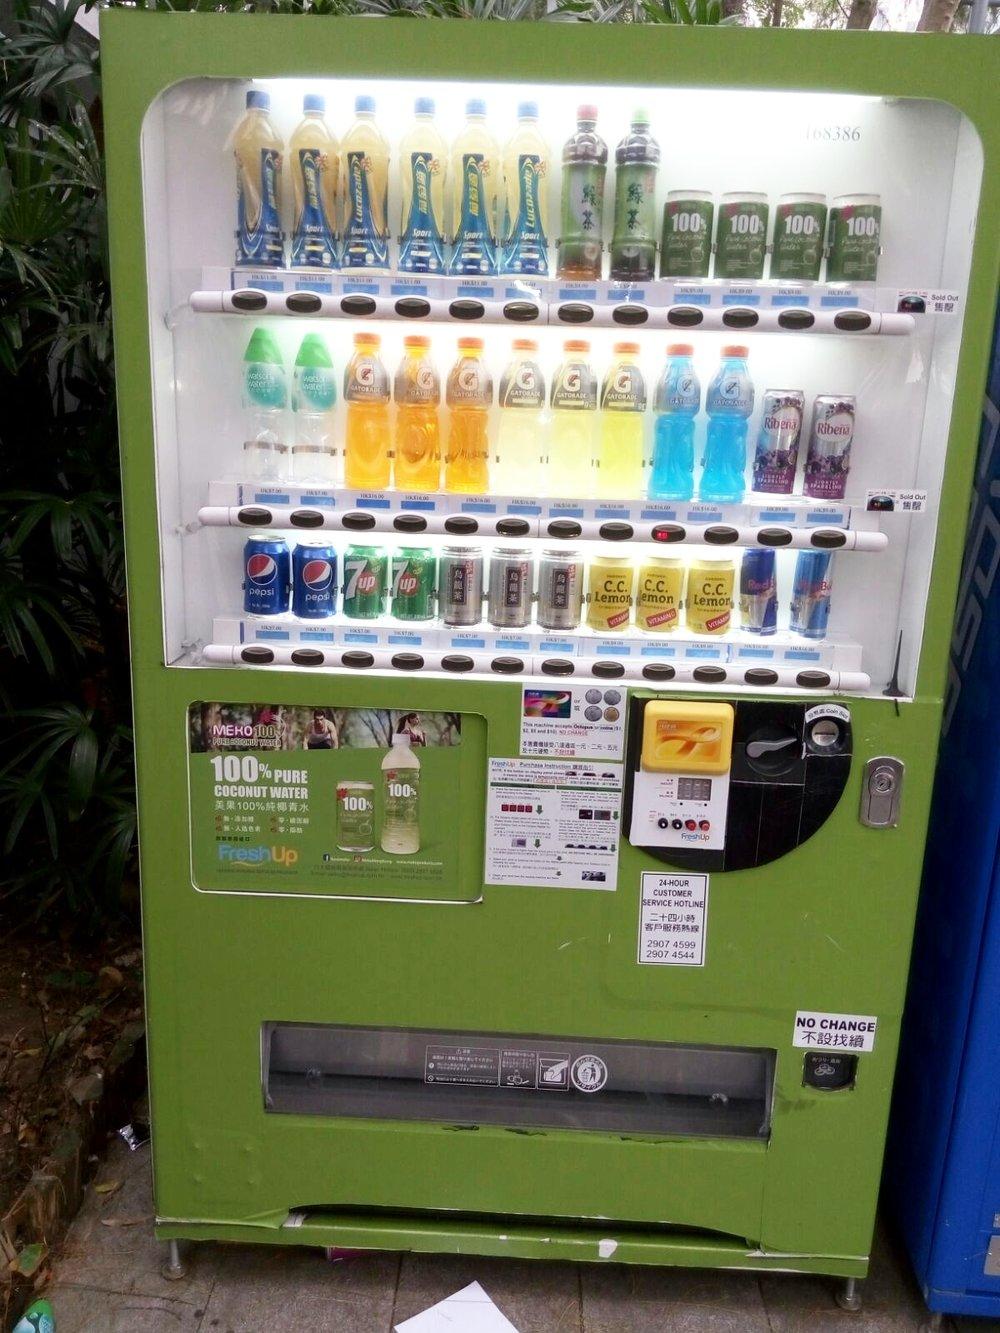 FreshUp,自動售賣機,自動販賣機,零食,飲品,方便,快捷,智能,LCSD,康文署